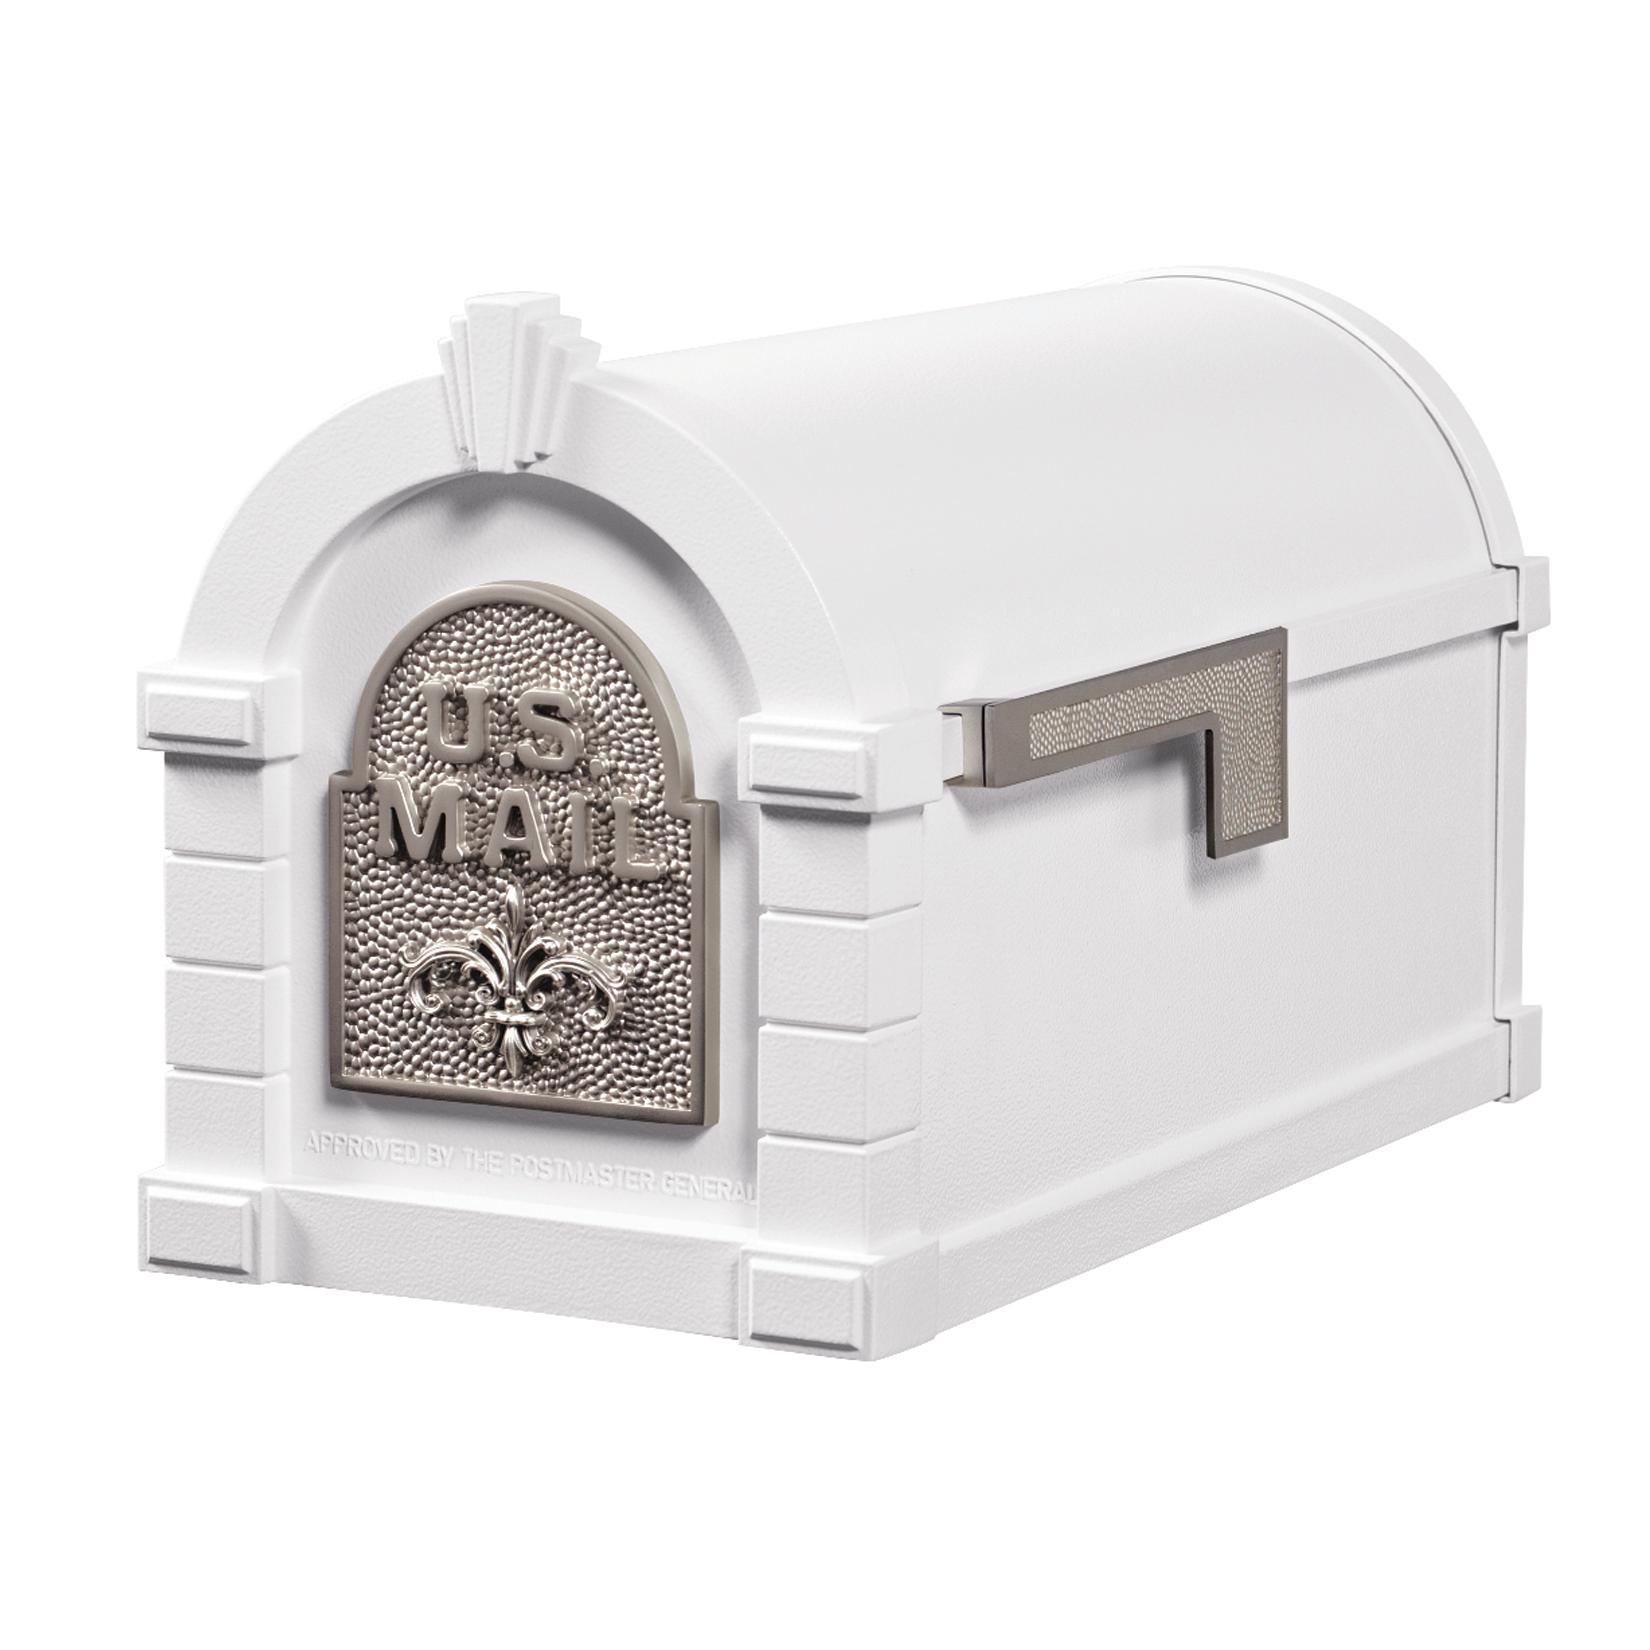 Gaines Fleur De Lis Keystone MailboxesWhite with Satin Nickel